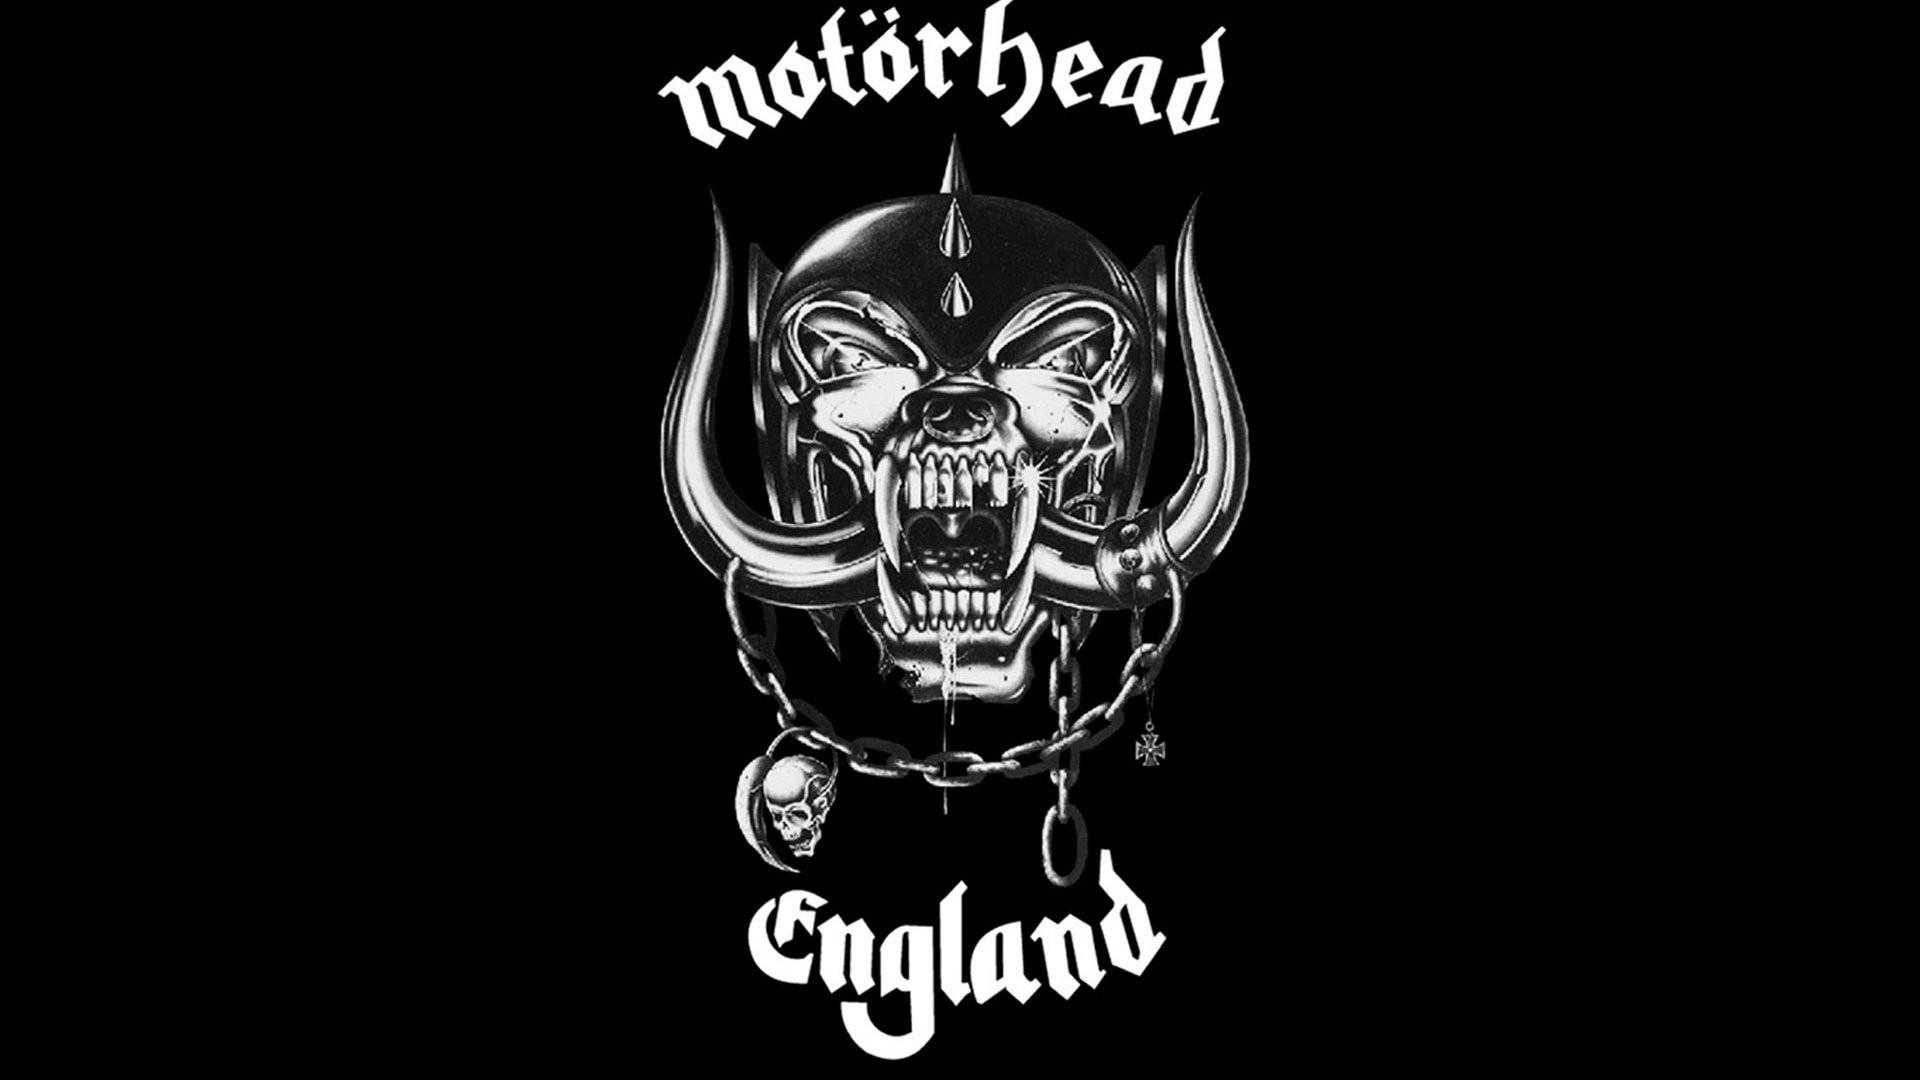 Motorhead Wallpaper HD (50+ images)